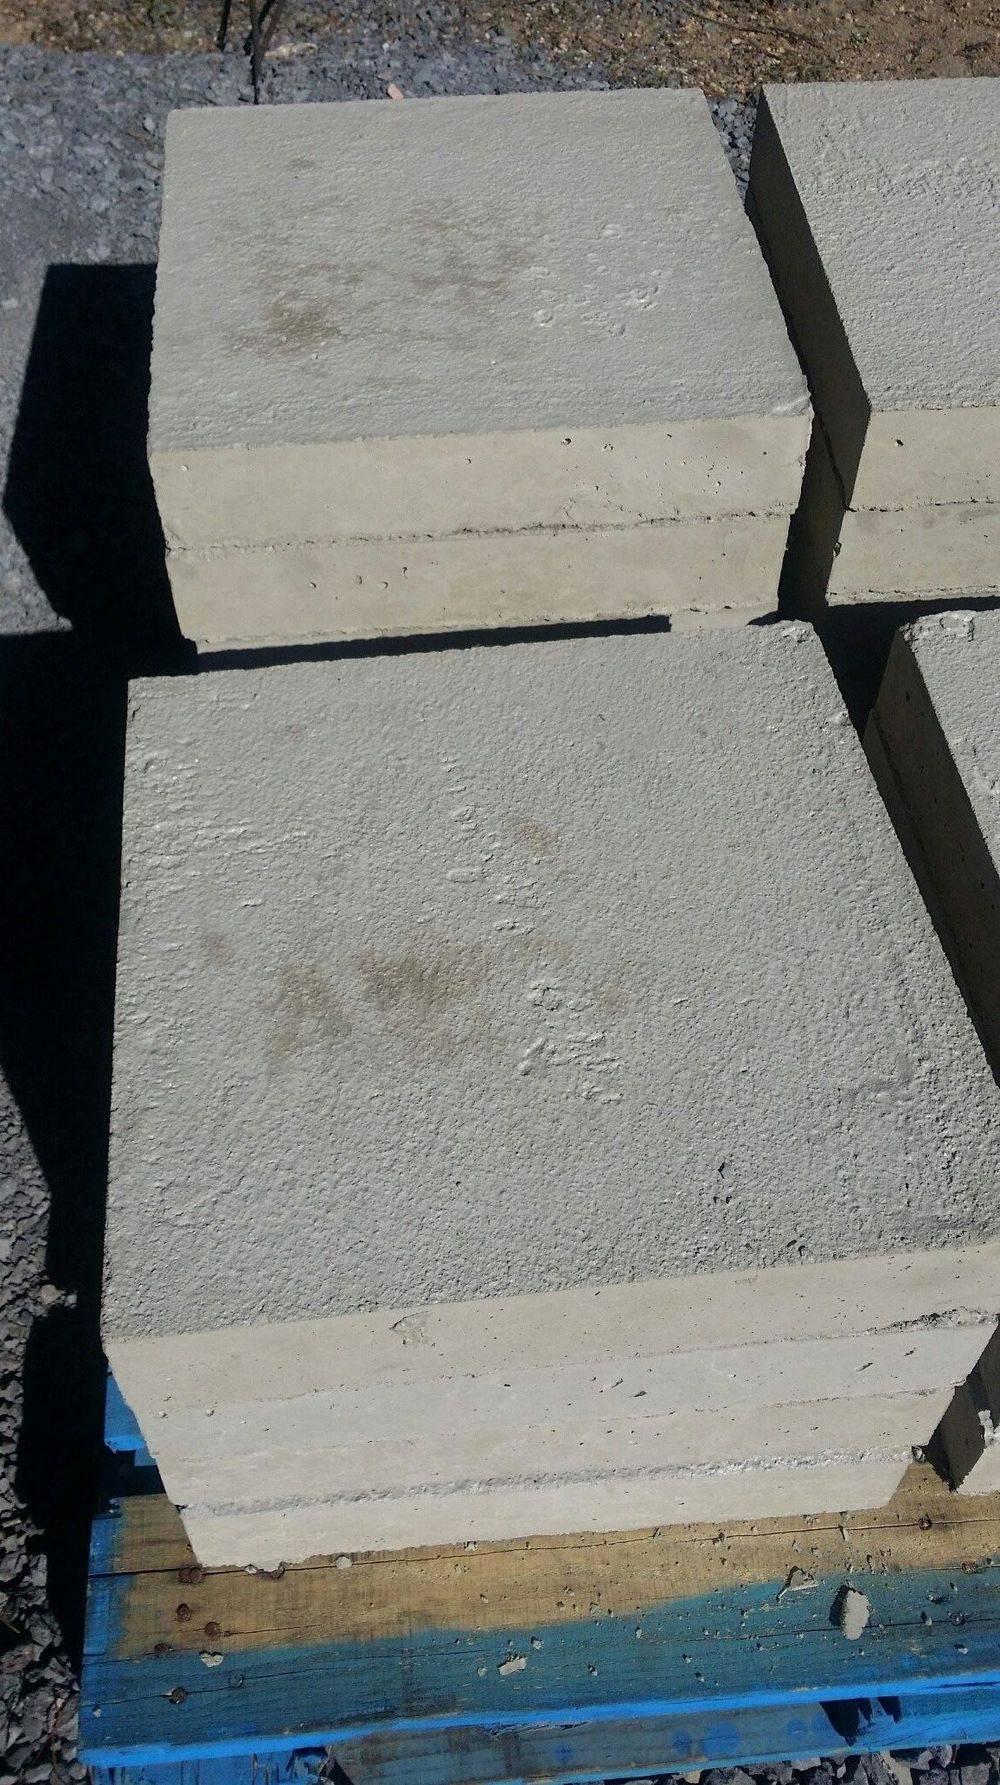 Square foundation blocks